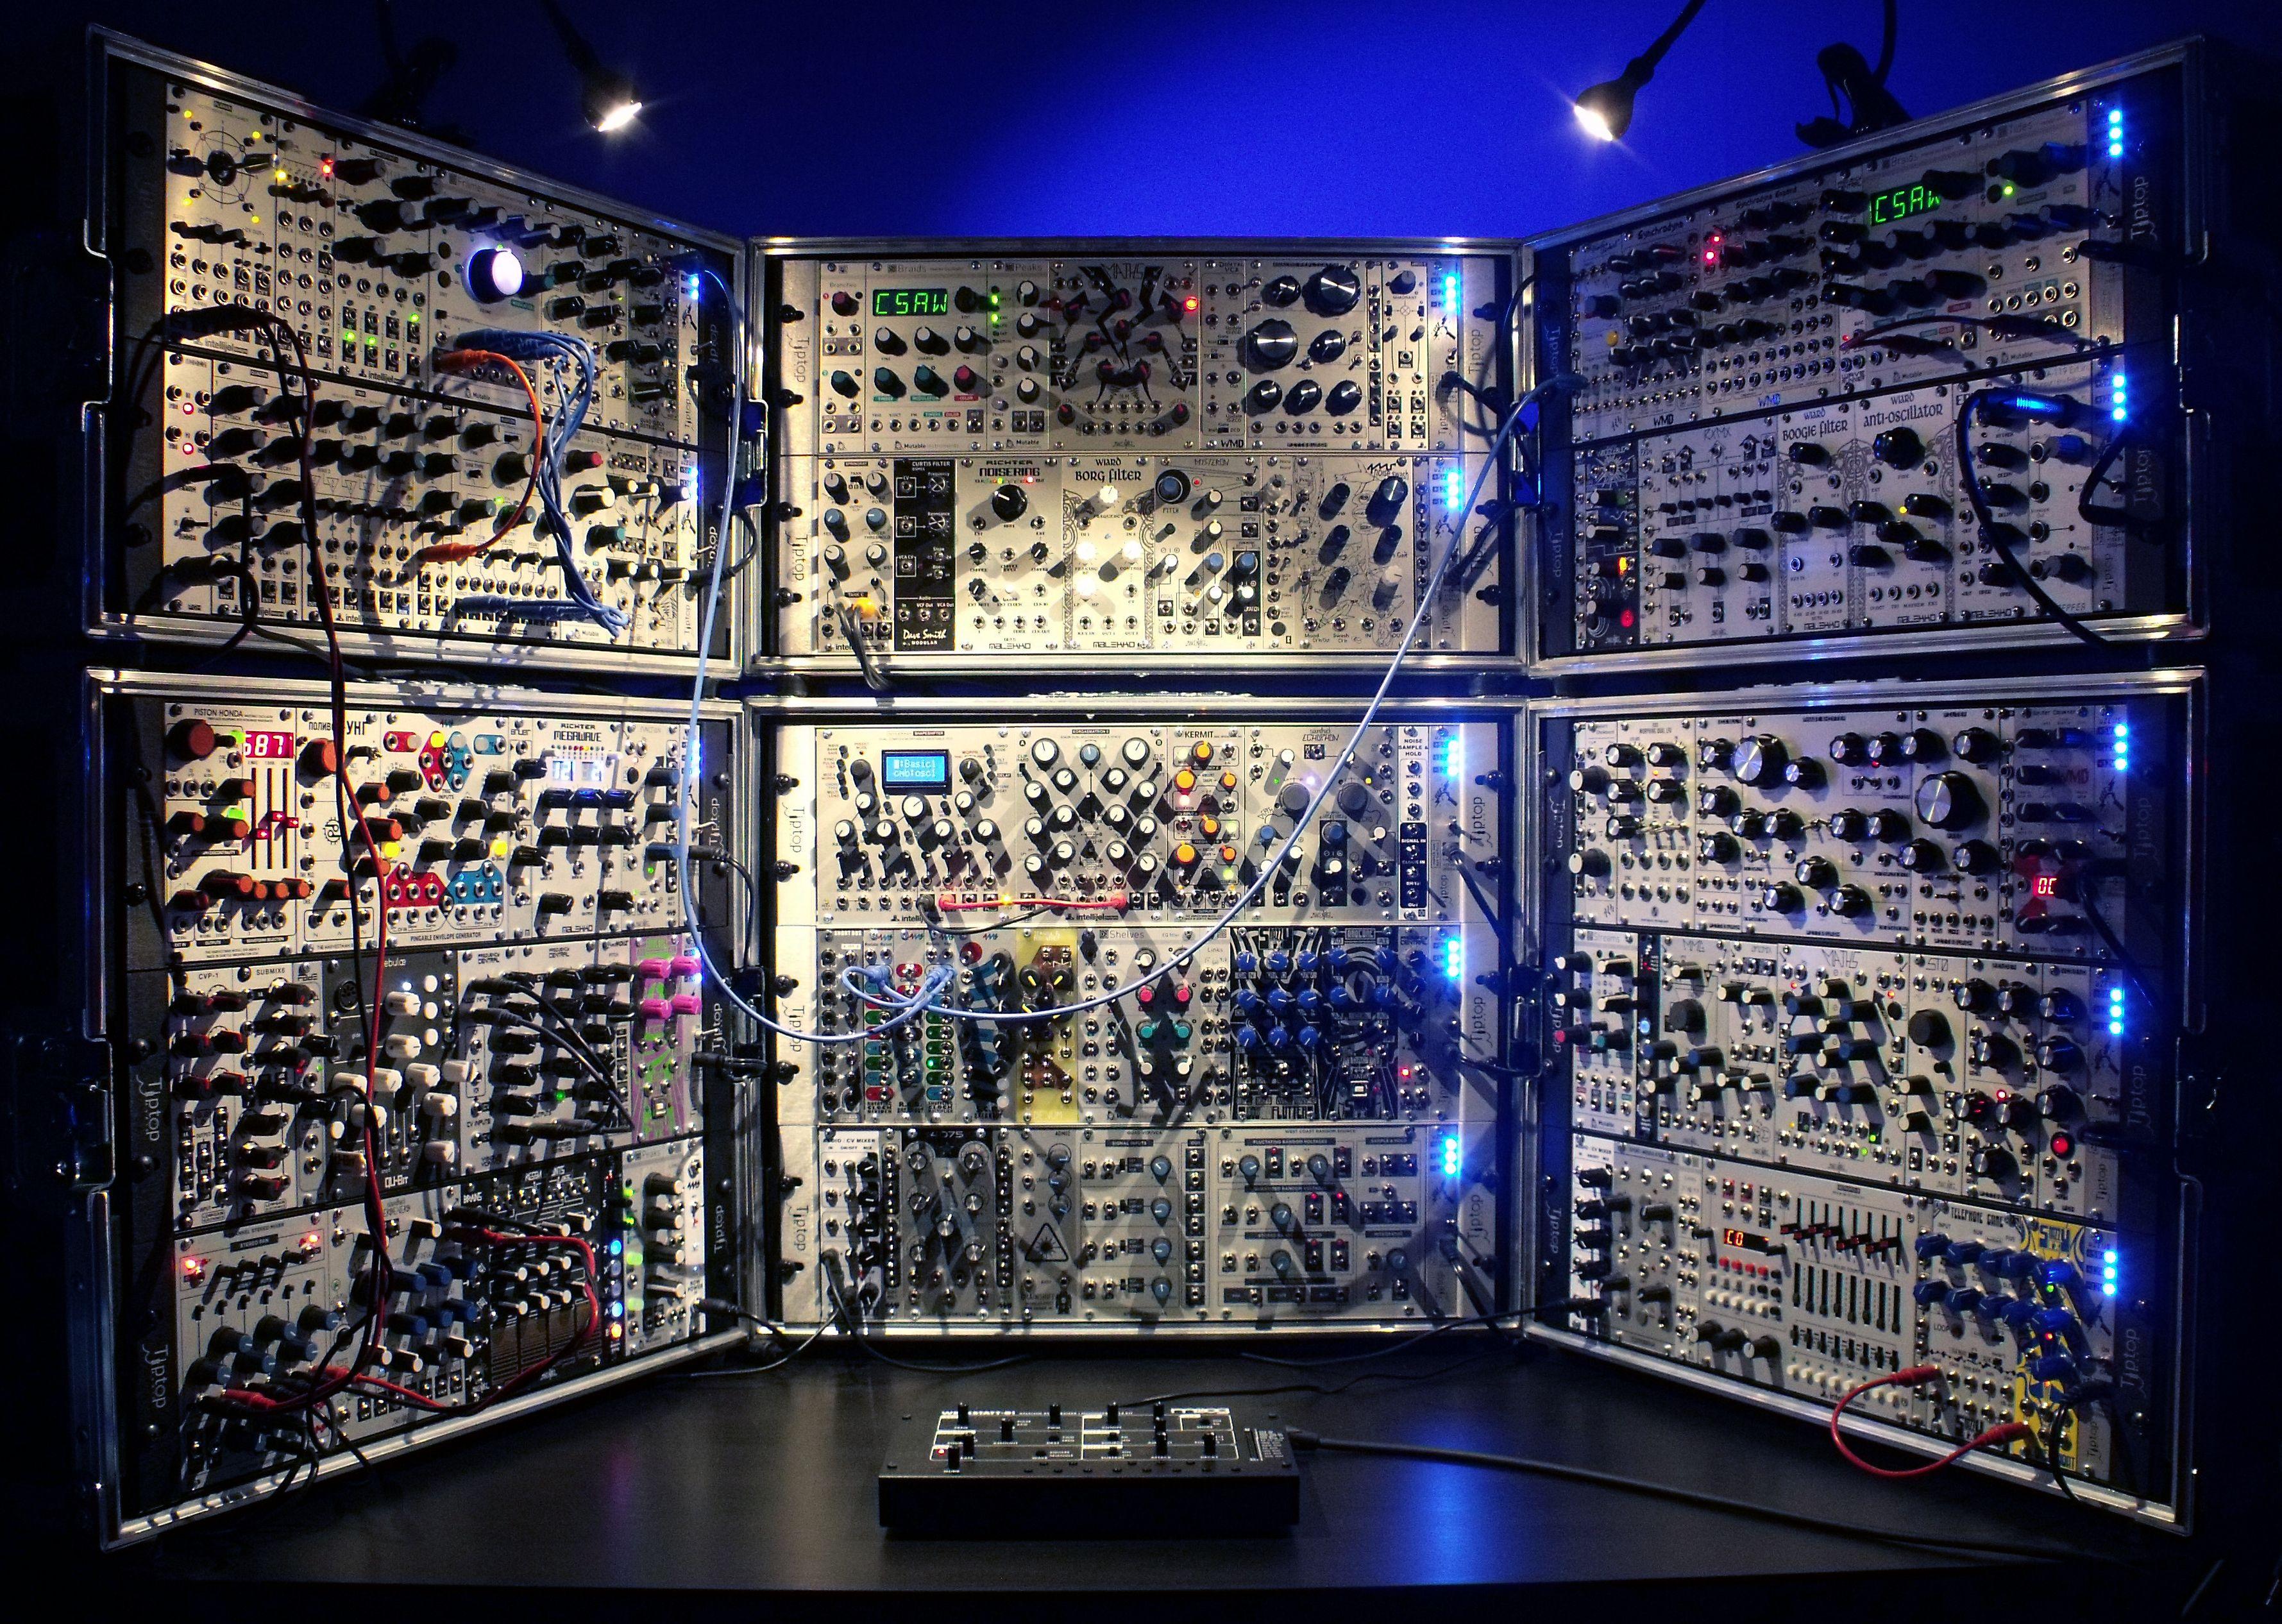 david kristian eurorack modular system 051615 synthesizers modular in 2019 midi. Black Bedroom Furniture Sets. Home Design Ideas